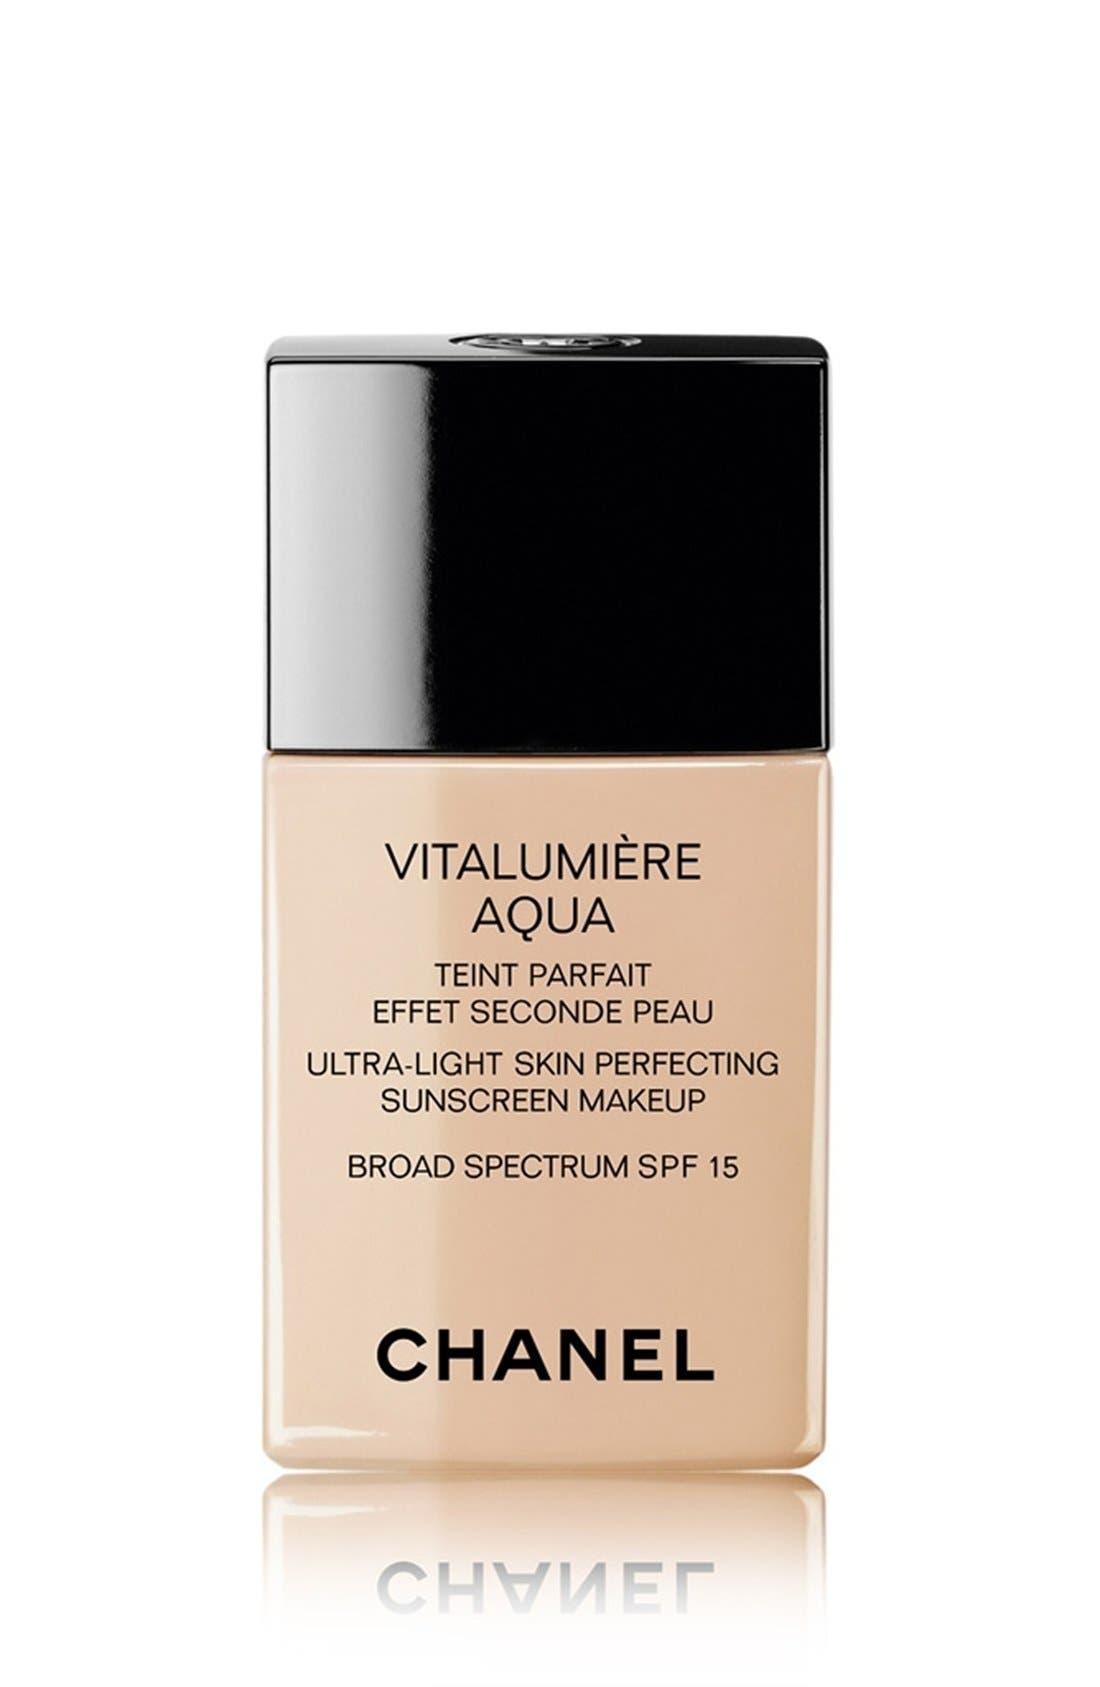 CHANEL VITALUMIÈRE AQUA  Ultra-Light Skin Perfecting Sunscreen Makeup Broad Spectrum SPF 15